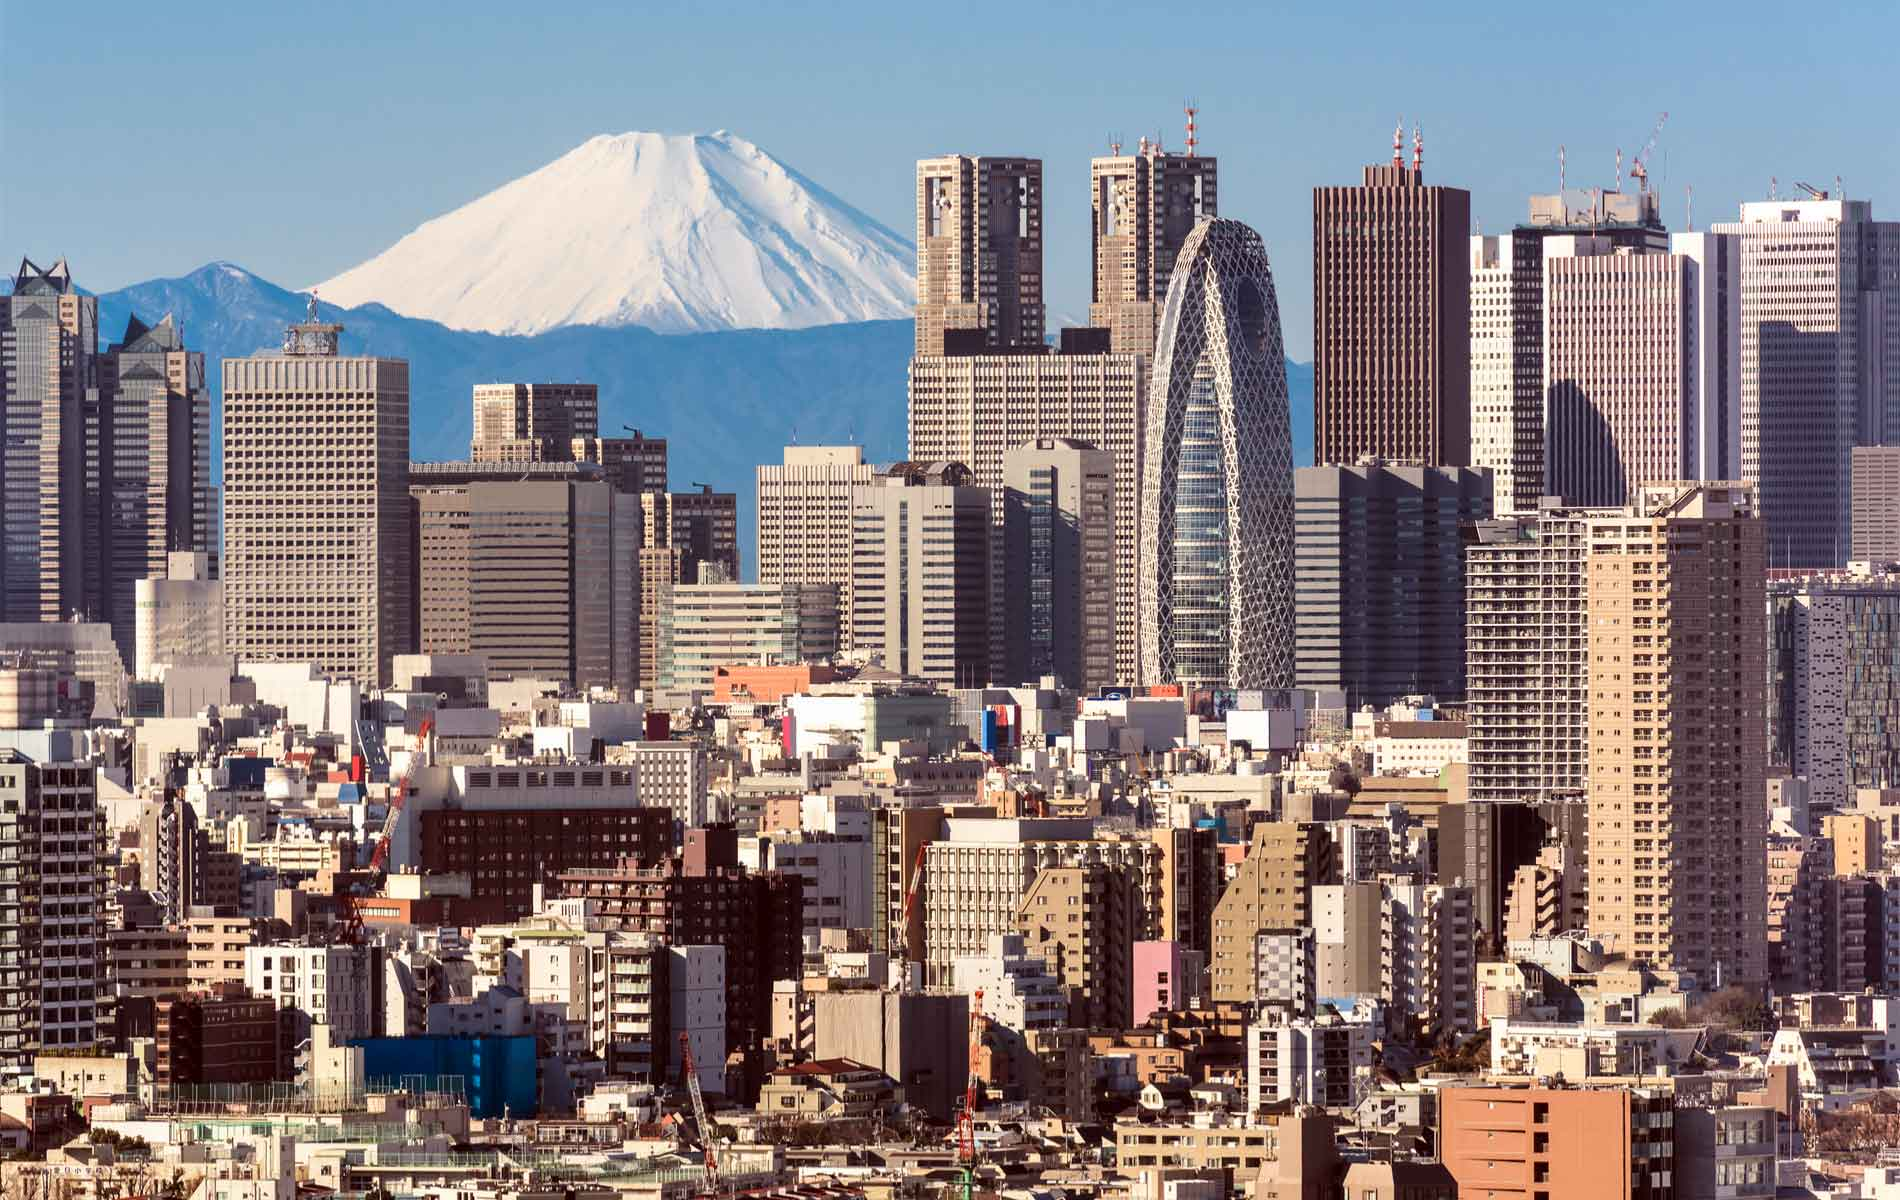 Mount Fuji sitting behind the skyscrapers of Tokyo